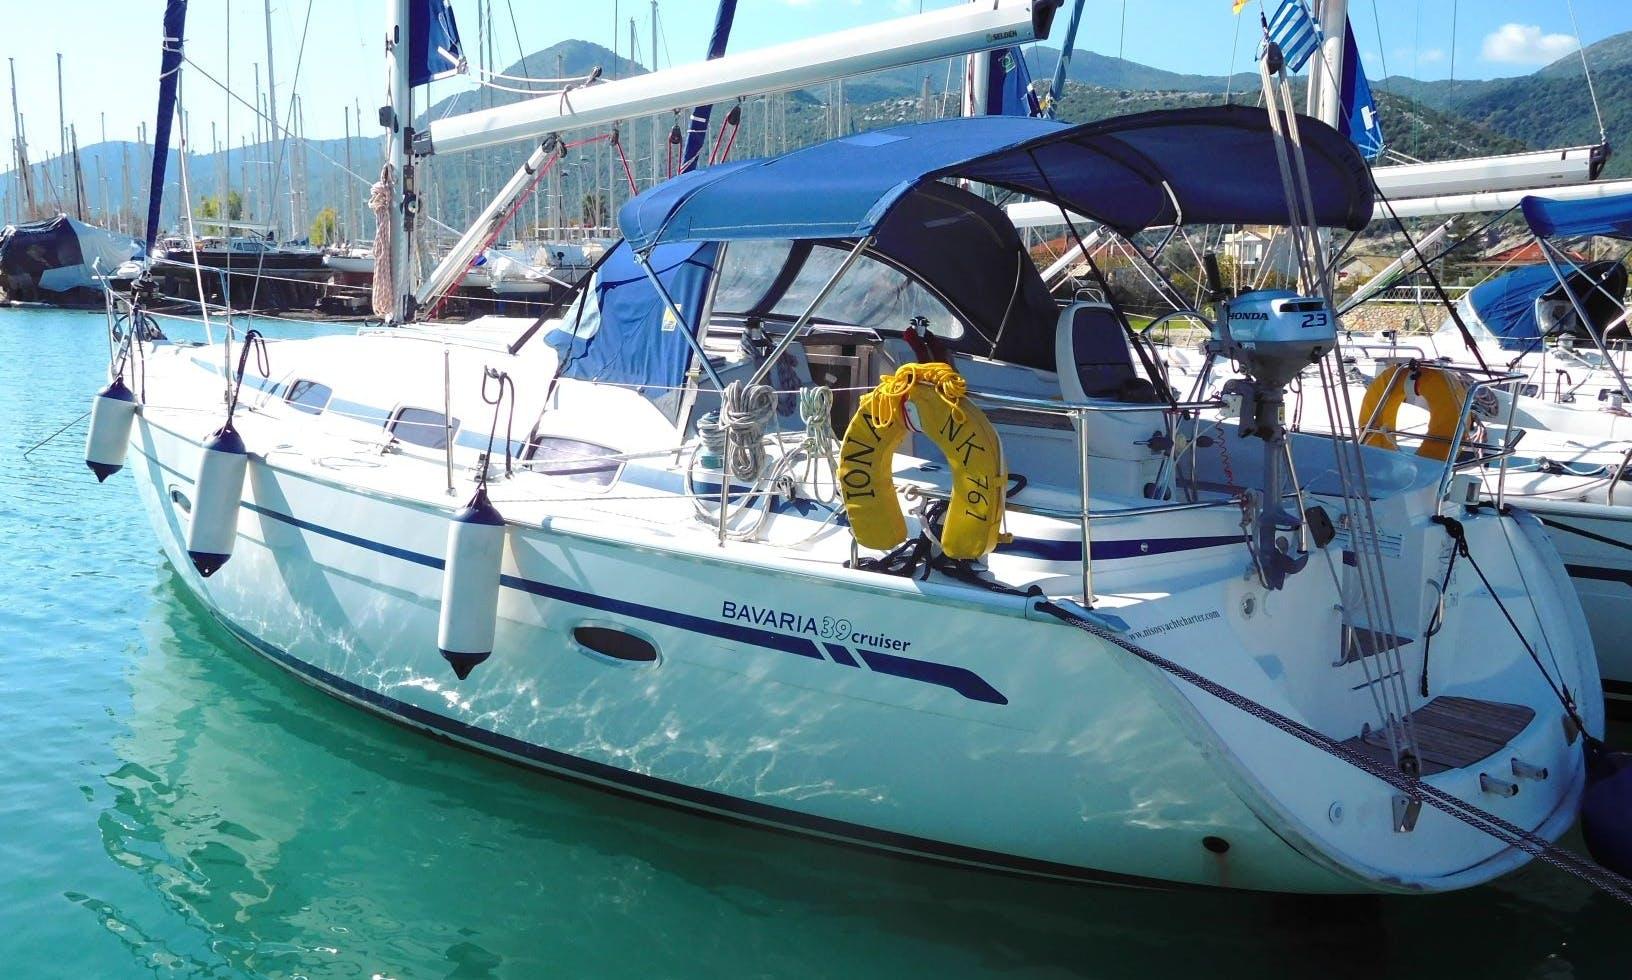 Iona - Bavaria 39ft (2007) Yacht Charter in Lefkada, Greece